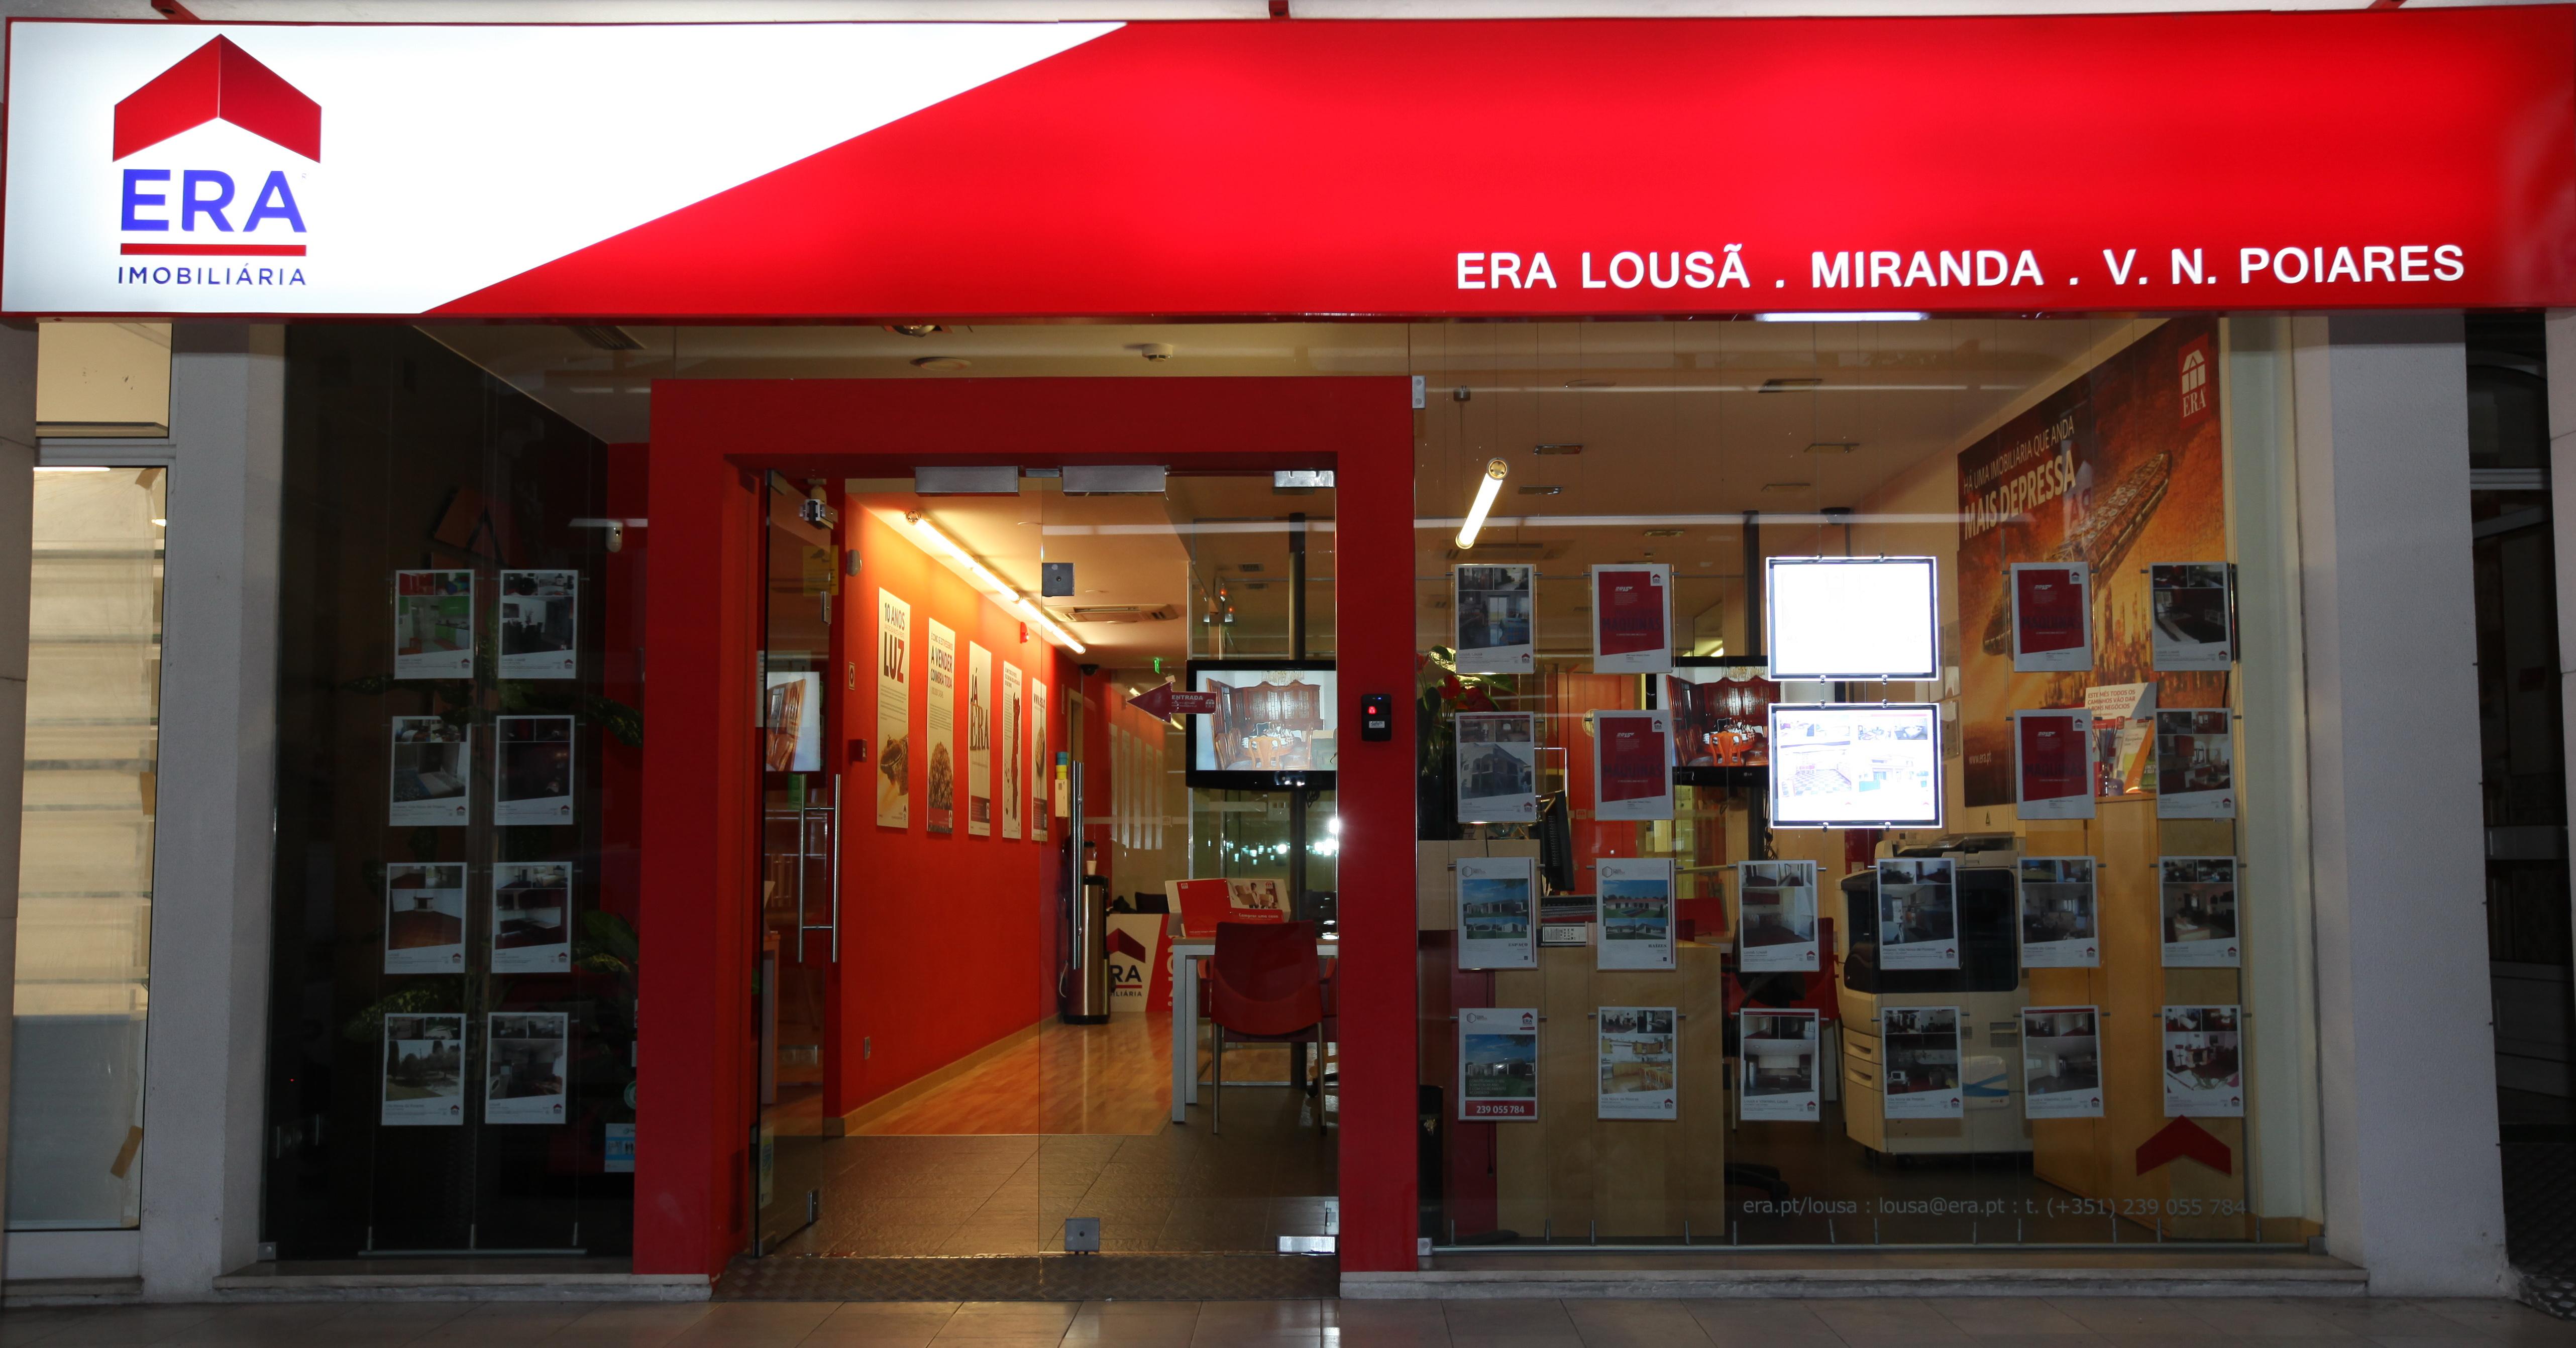 ERA Lousã/Miranda